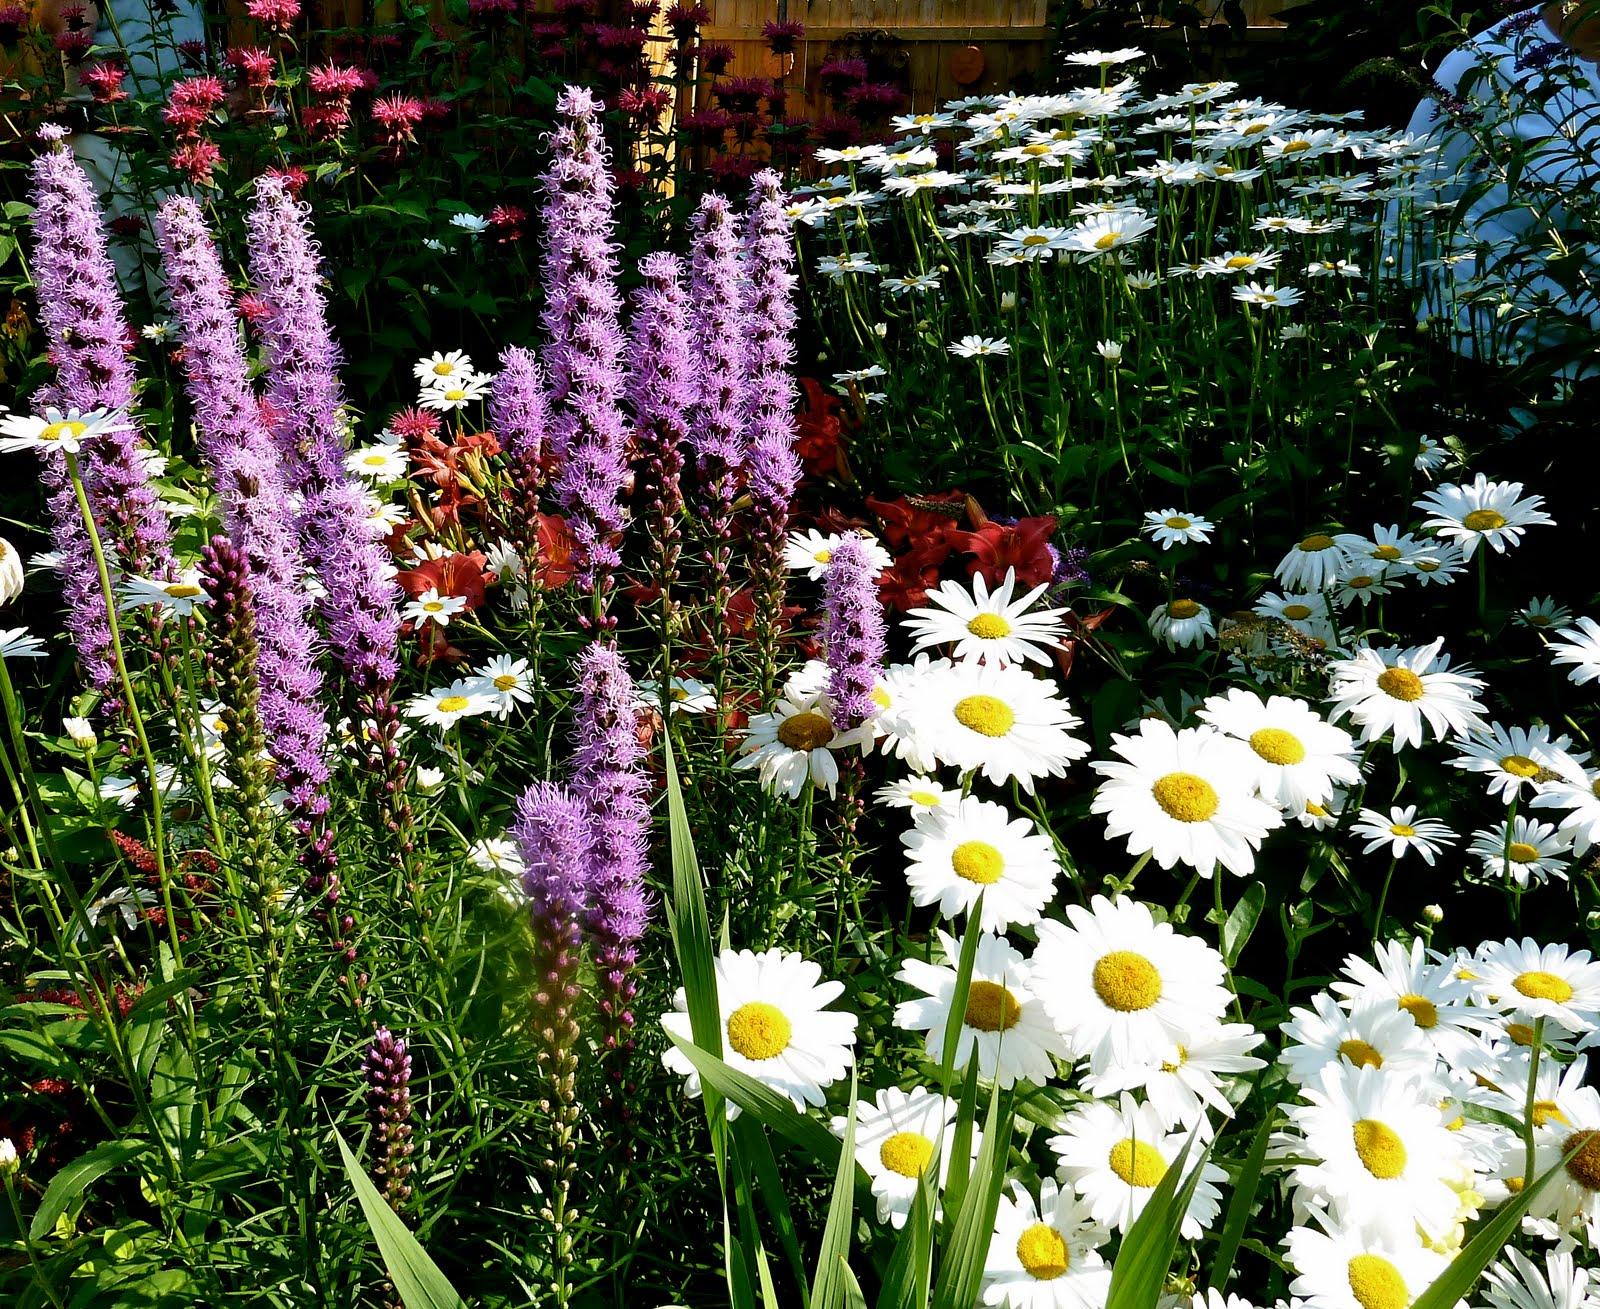 clay and limestone Big Ideas From Small Gardens Buffa10